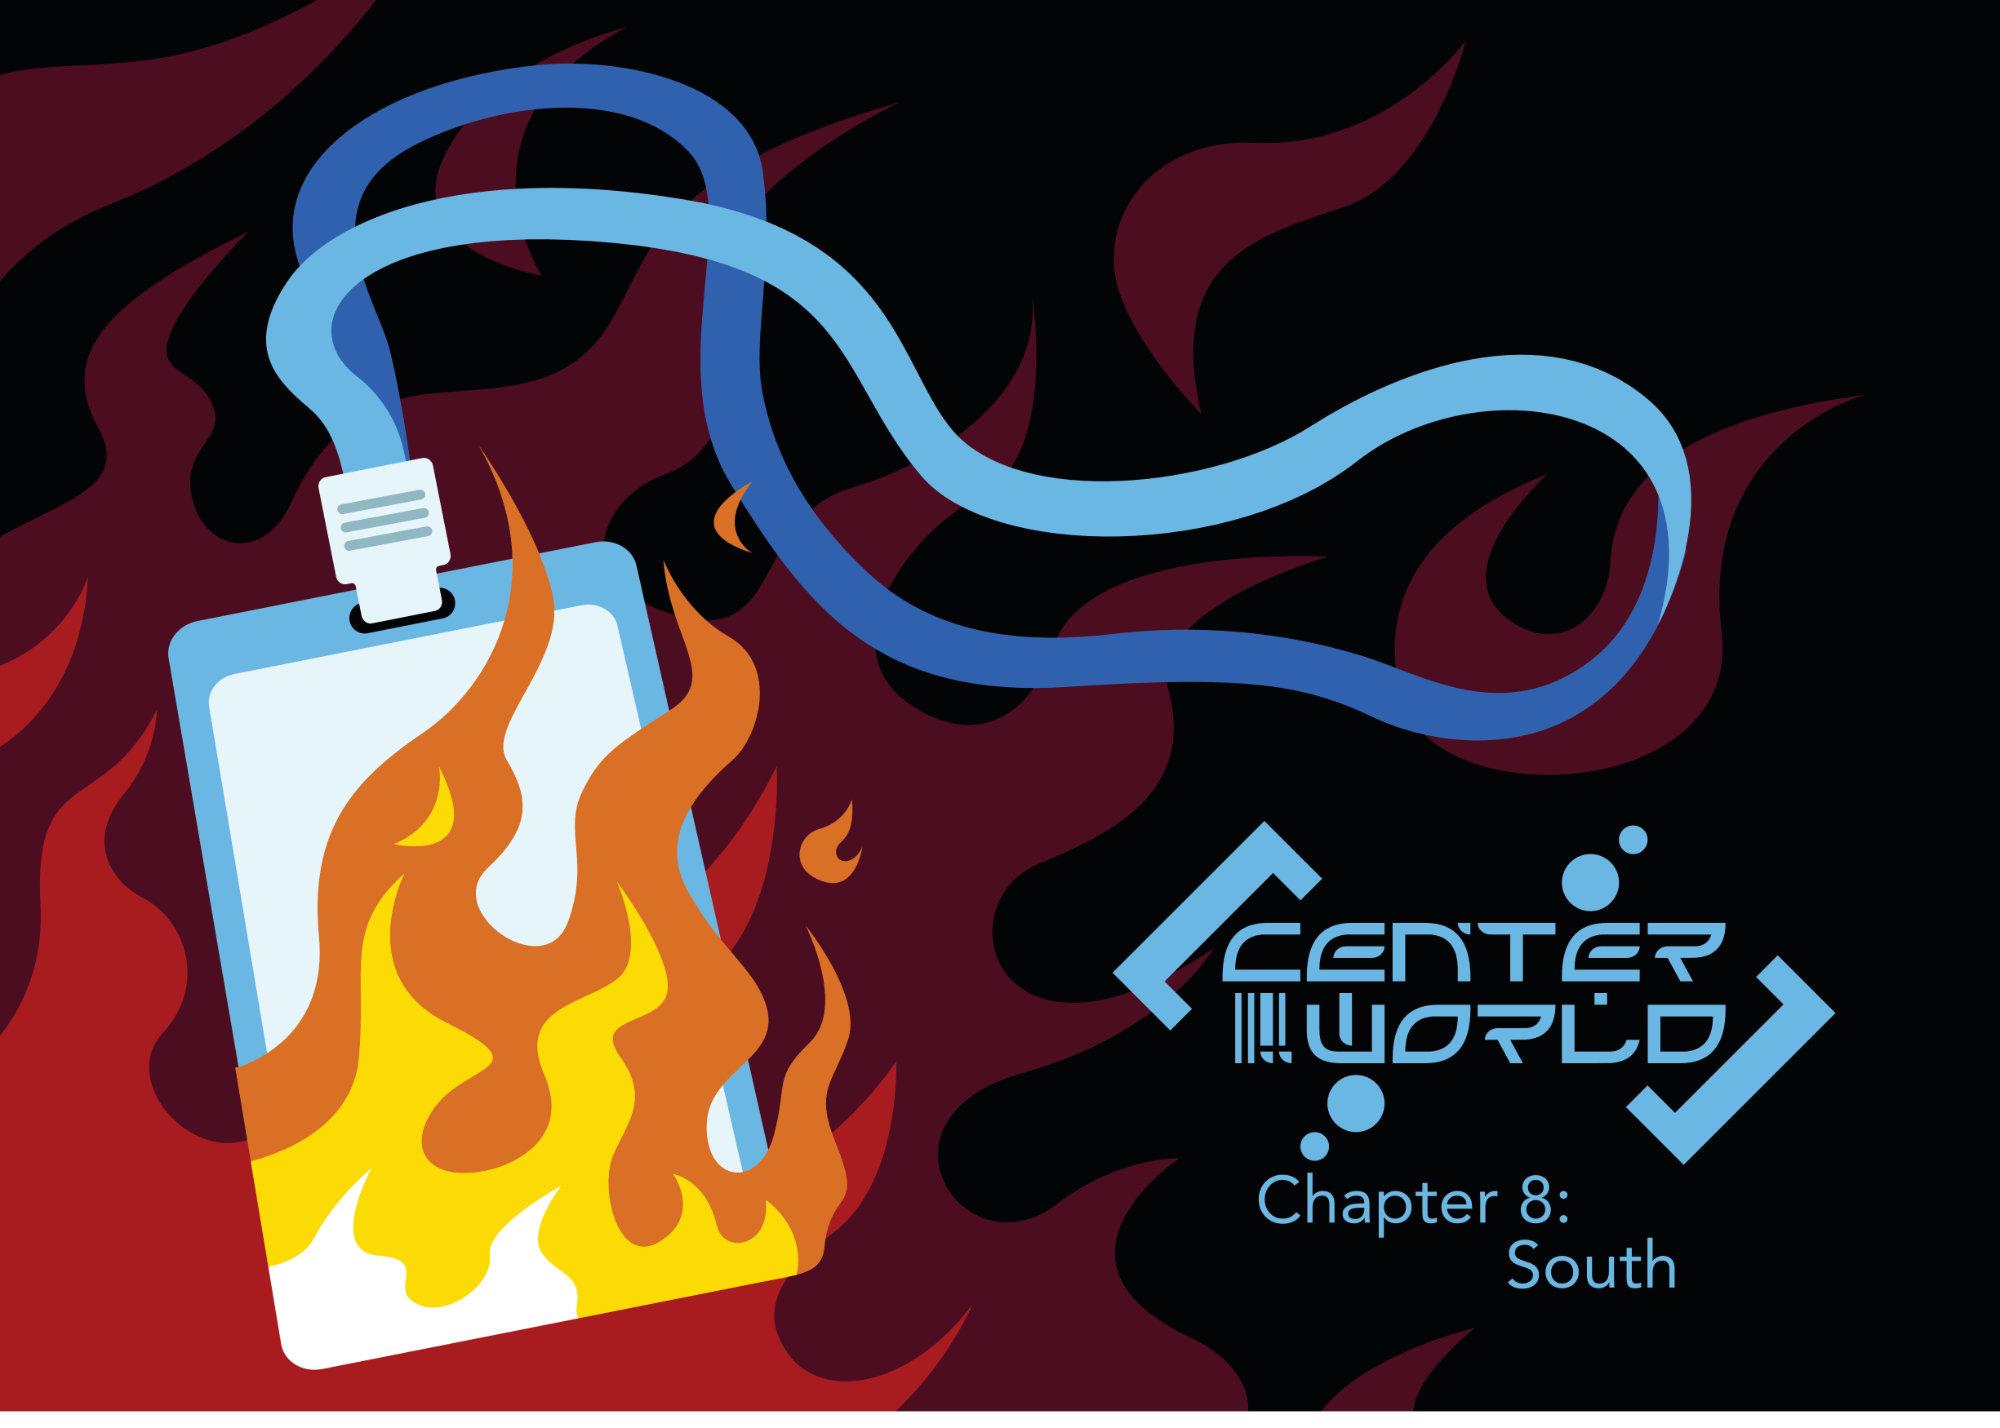 Center World 8.0